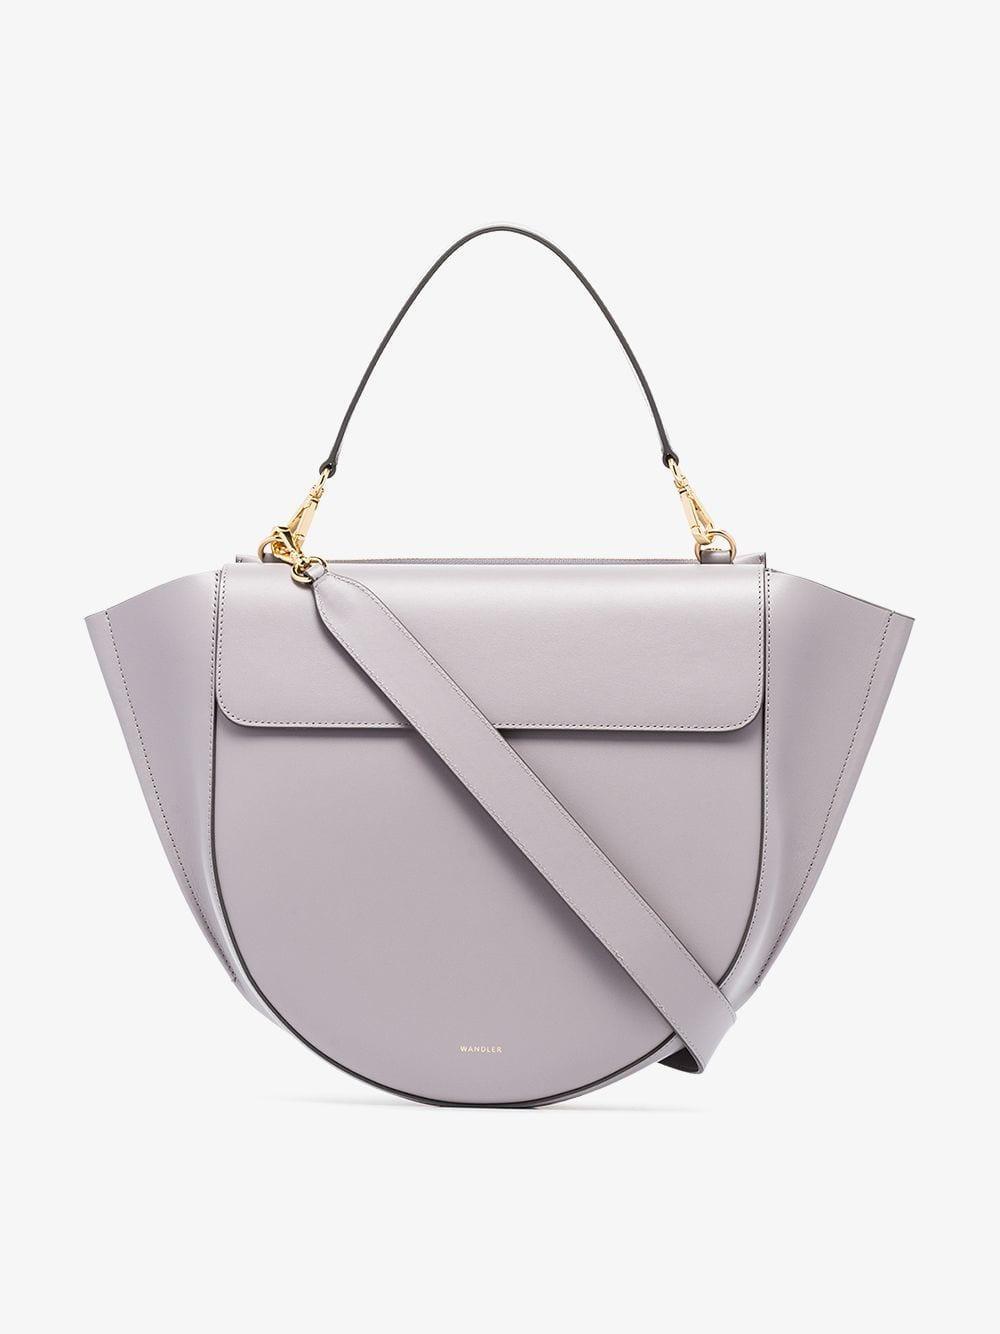 Lyst - Wandler Grey Hortensia Large Leather Shoulder Bag in Gray 8acf0146ea